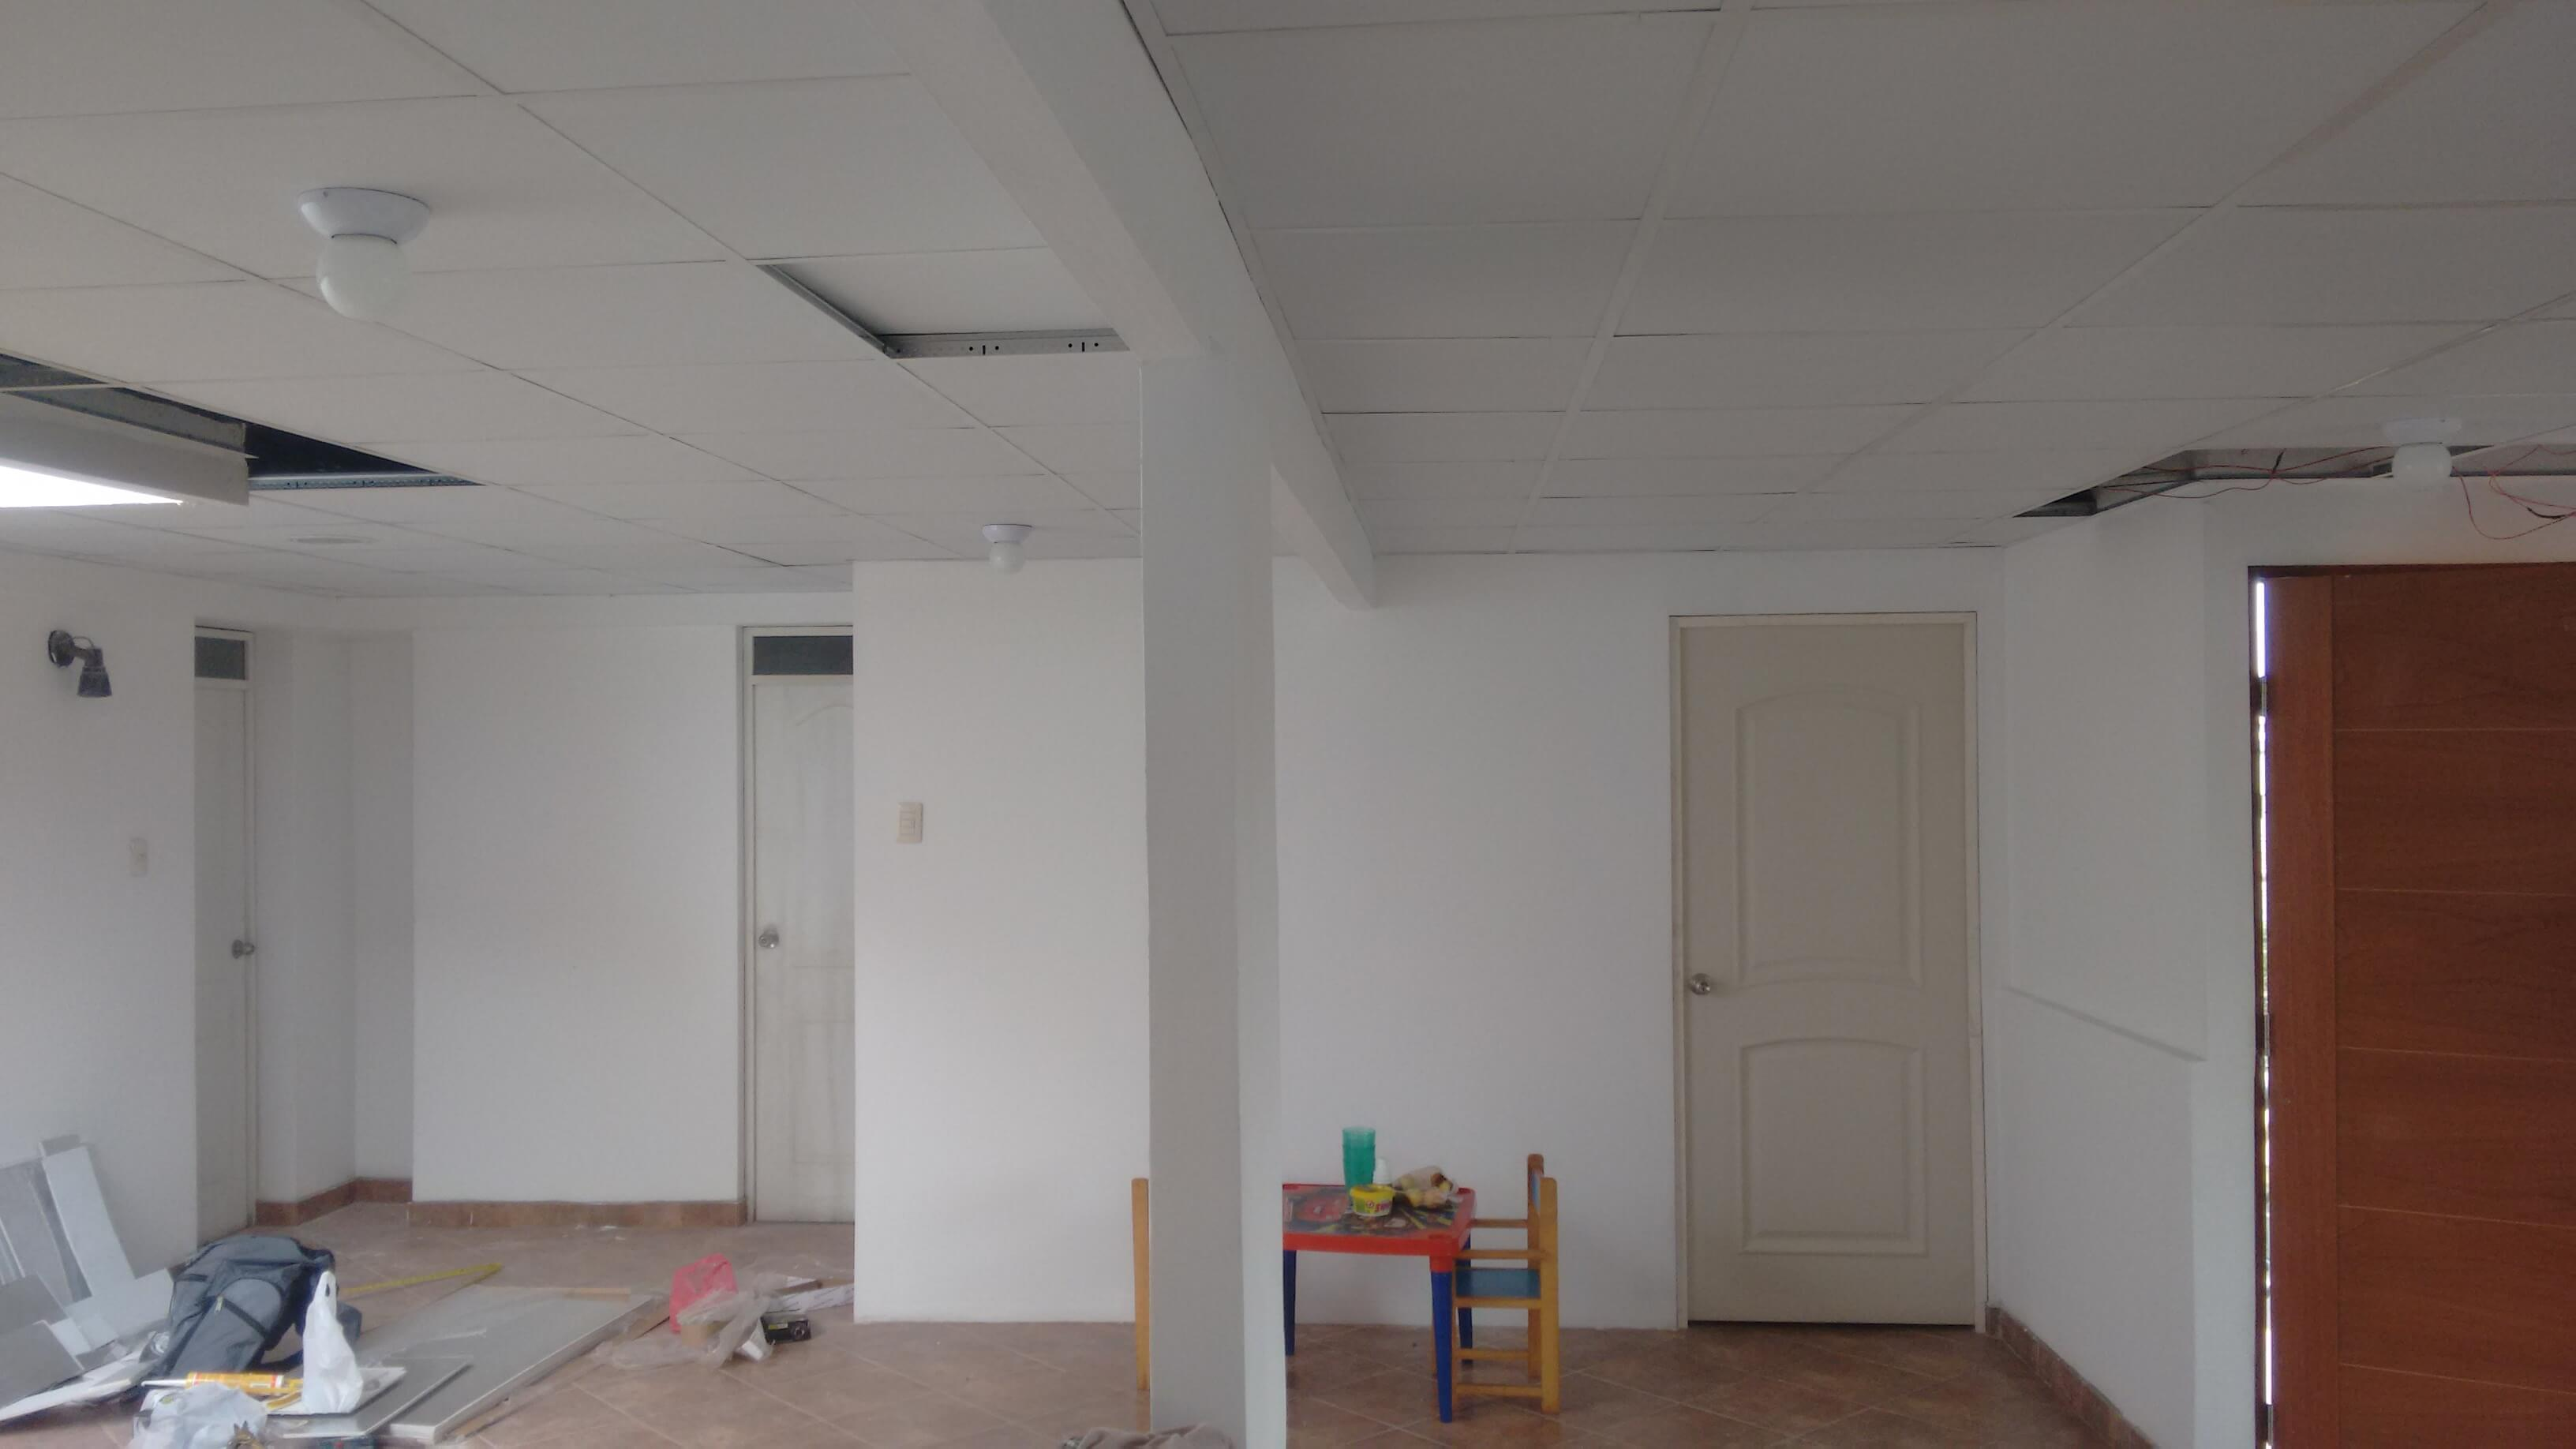 Cielo Raso Con Baldosas – Sistema Drywall